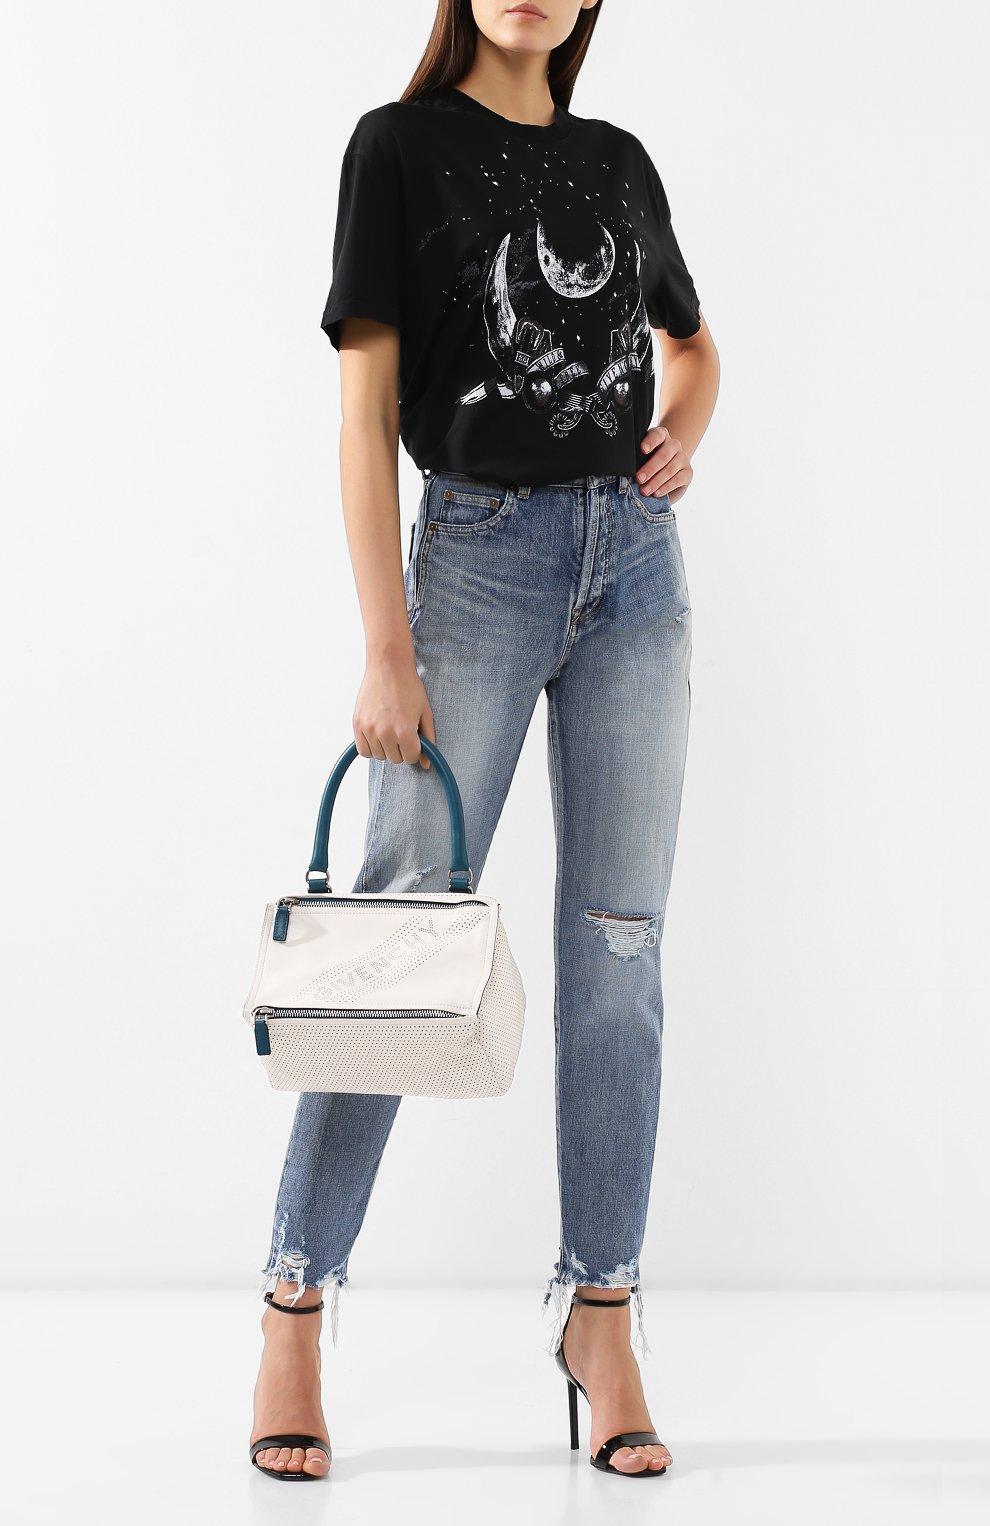 Кожаная сумка Pandora small Givenchy белая цвета | Фото №2